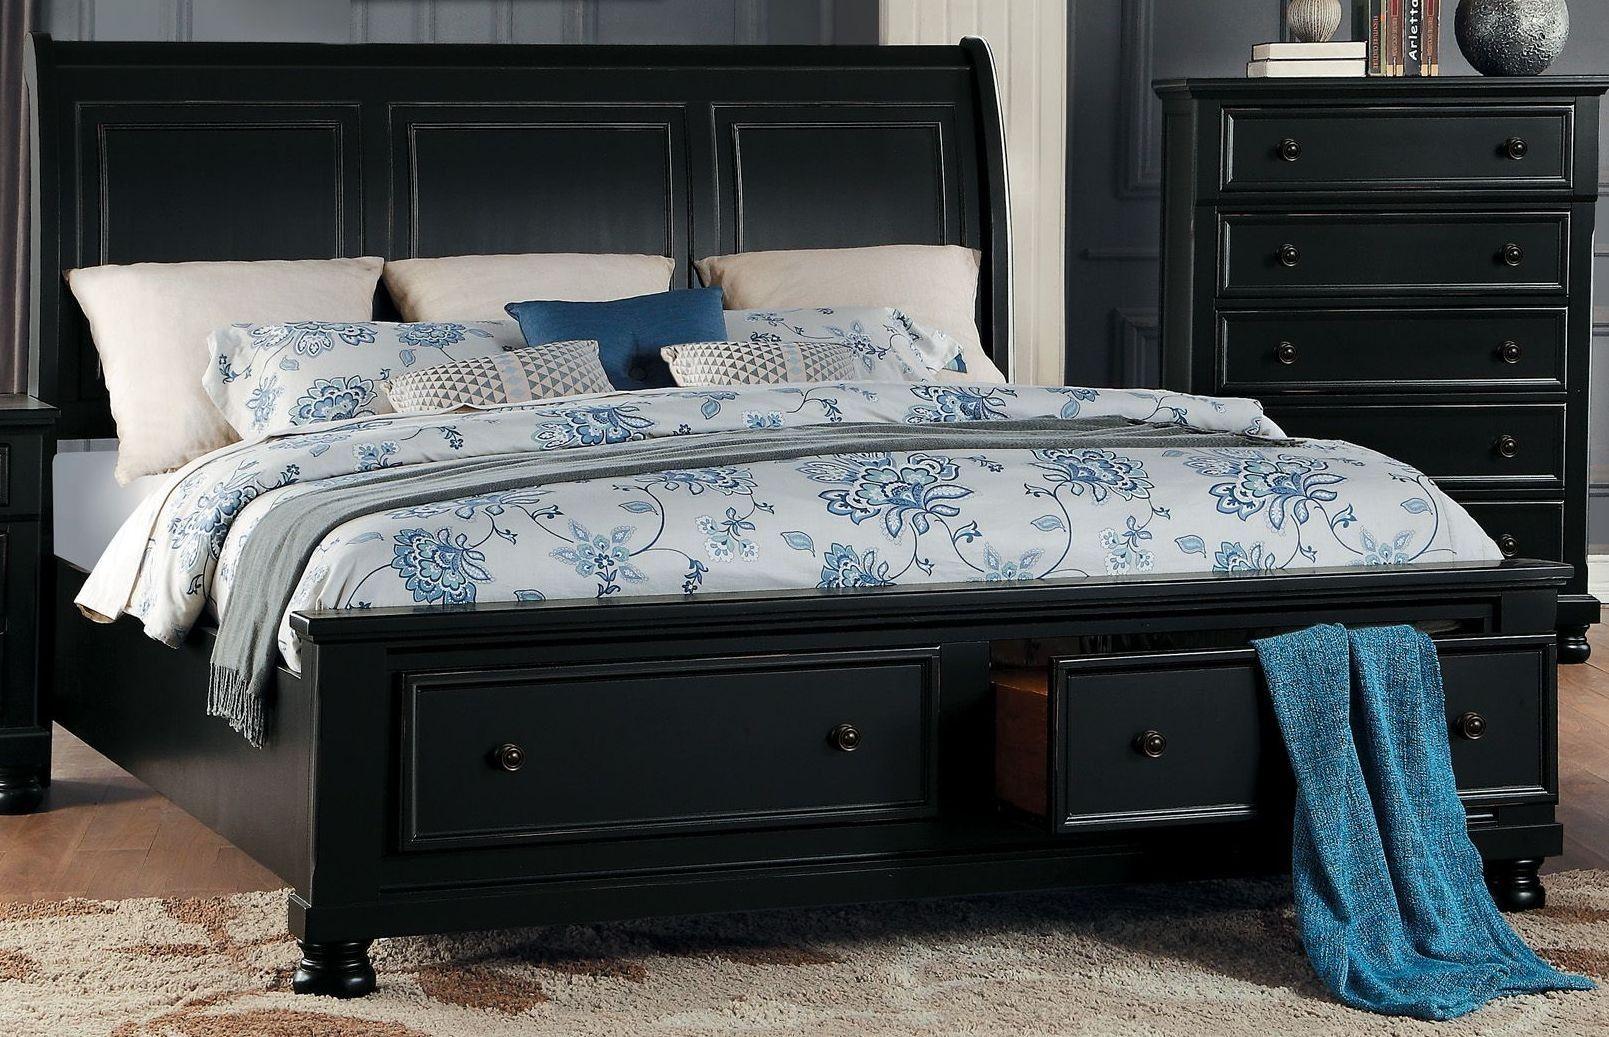 Laurelin Black King Sleigh Storage Bed Platform Bed With Storage King Size Bed Designs Queen Size Platform Bed